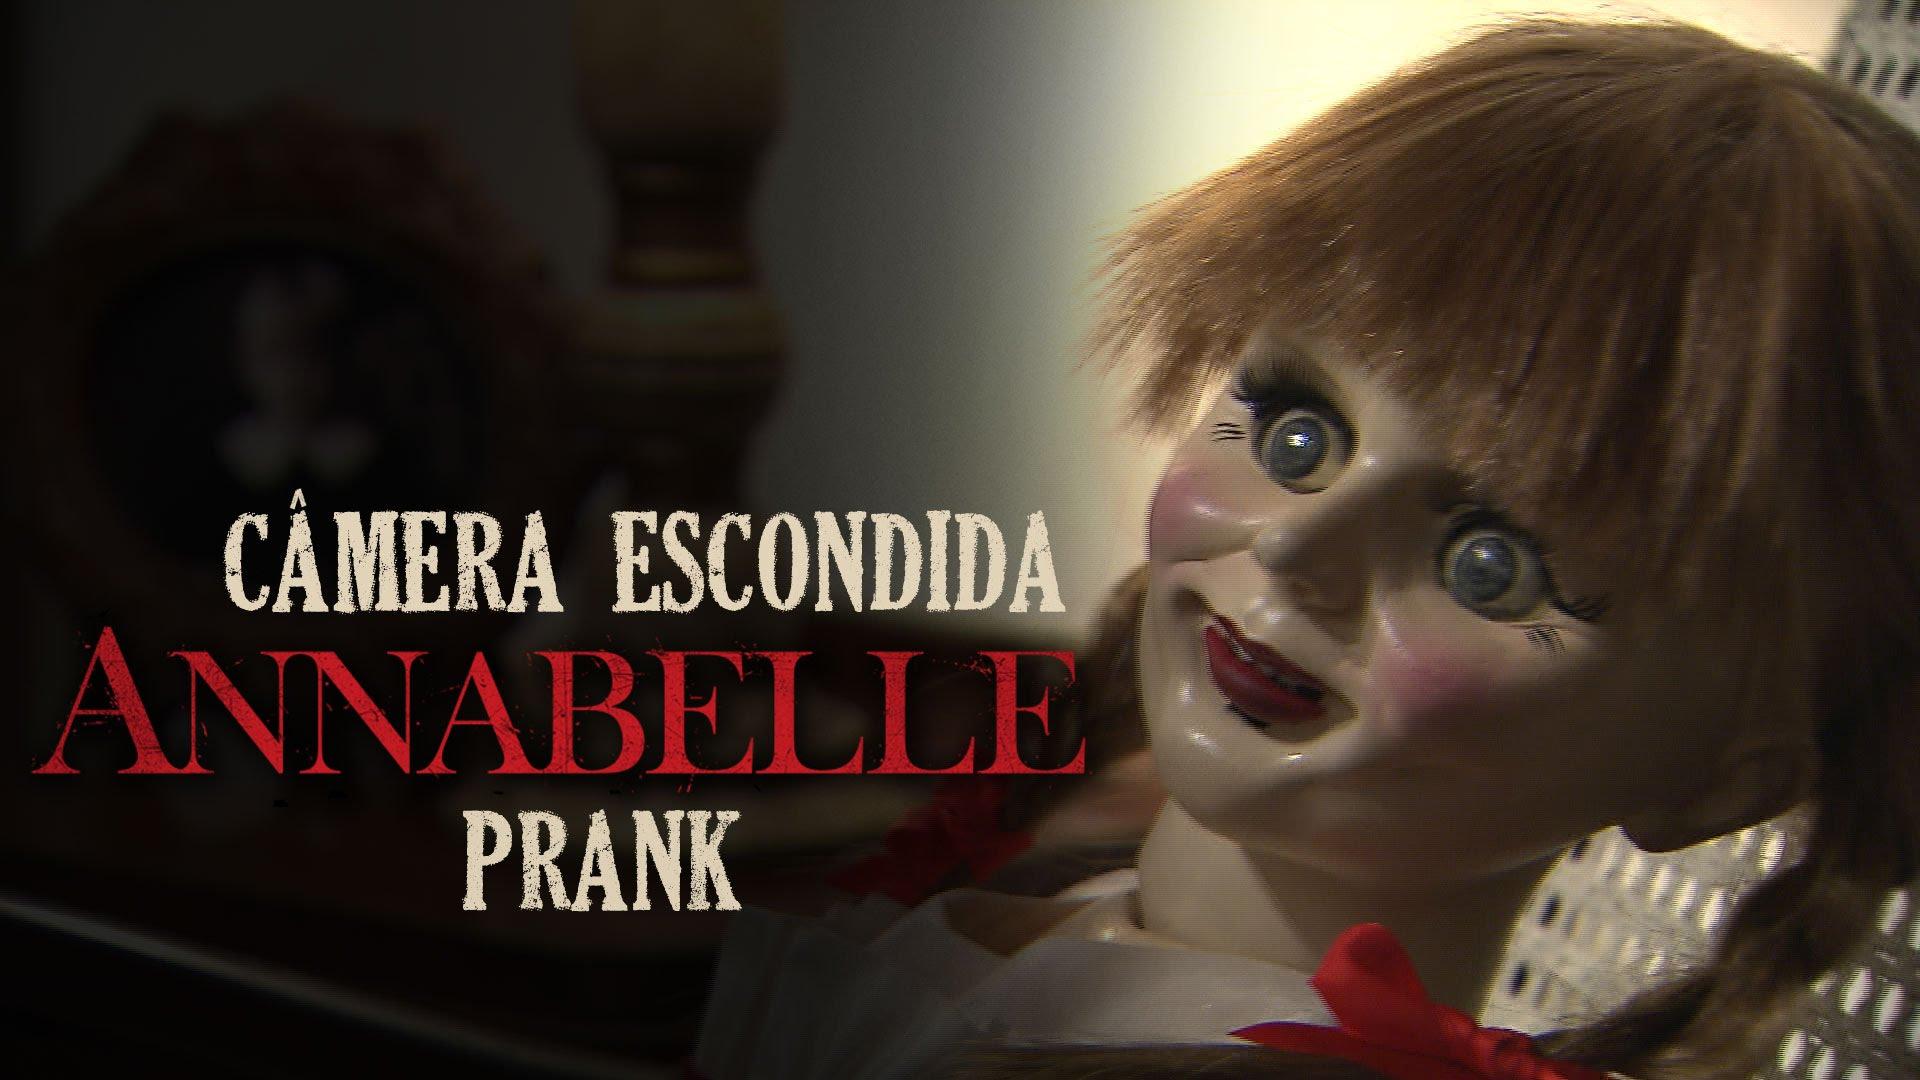 Annabelle desktop wallpaper